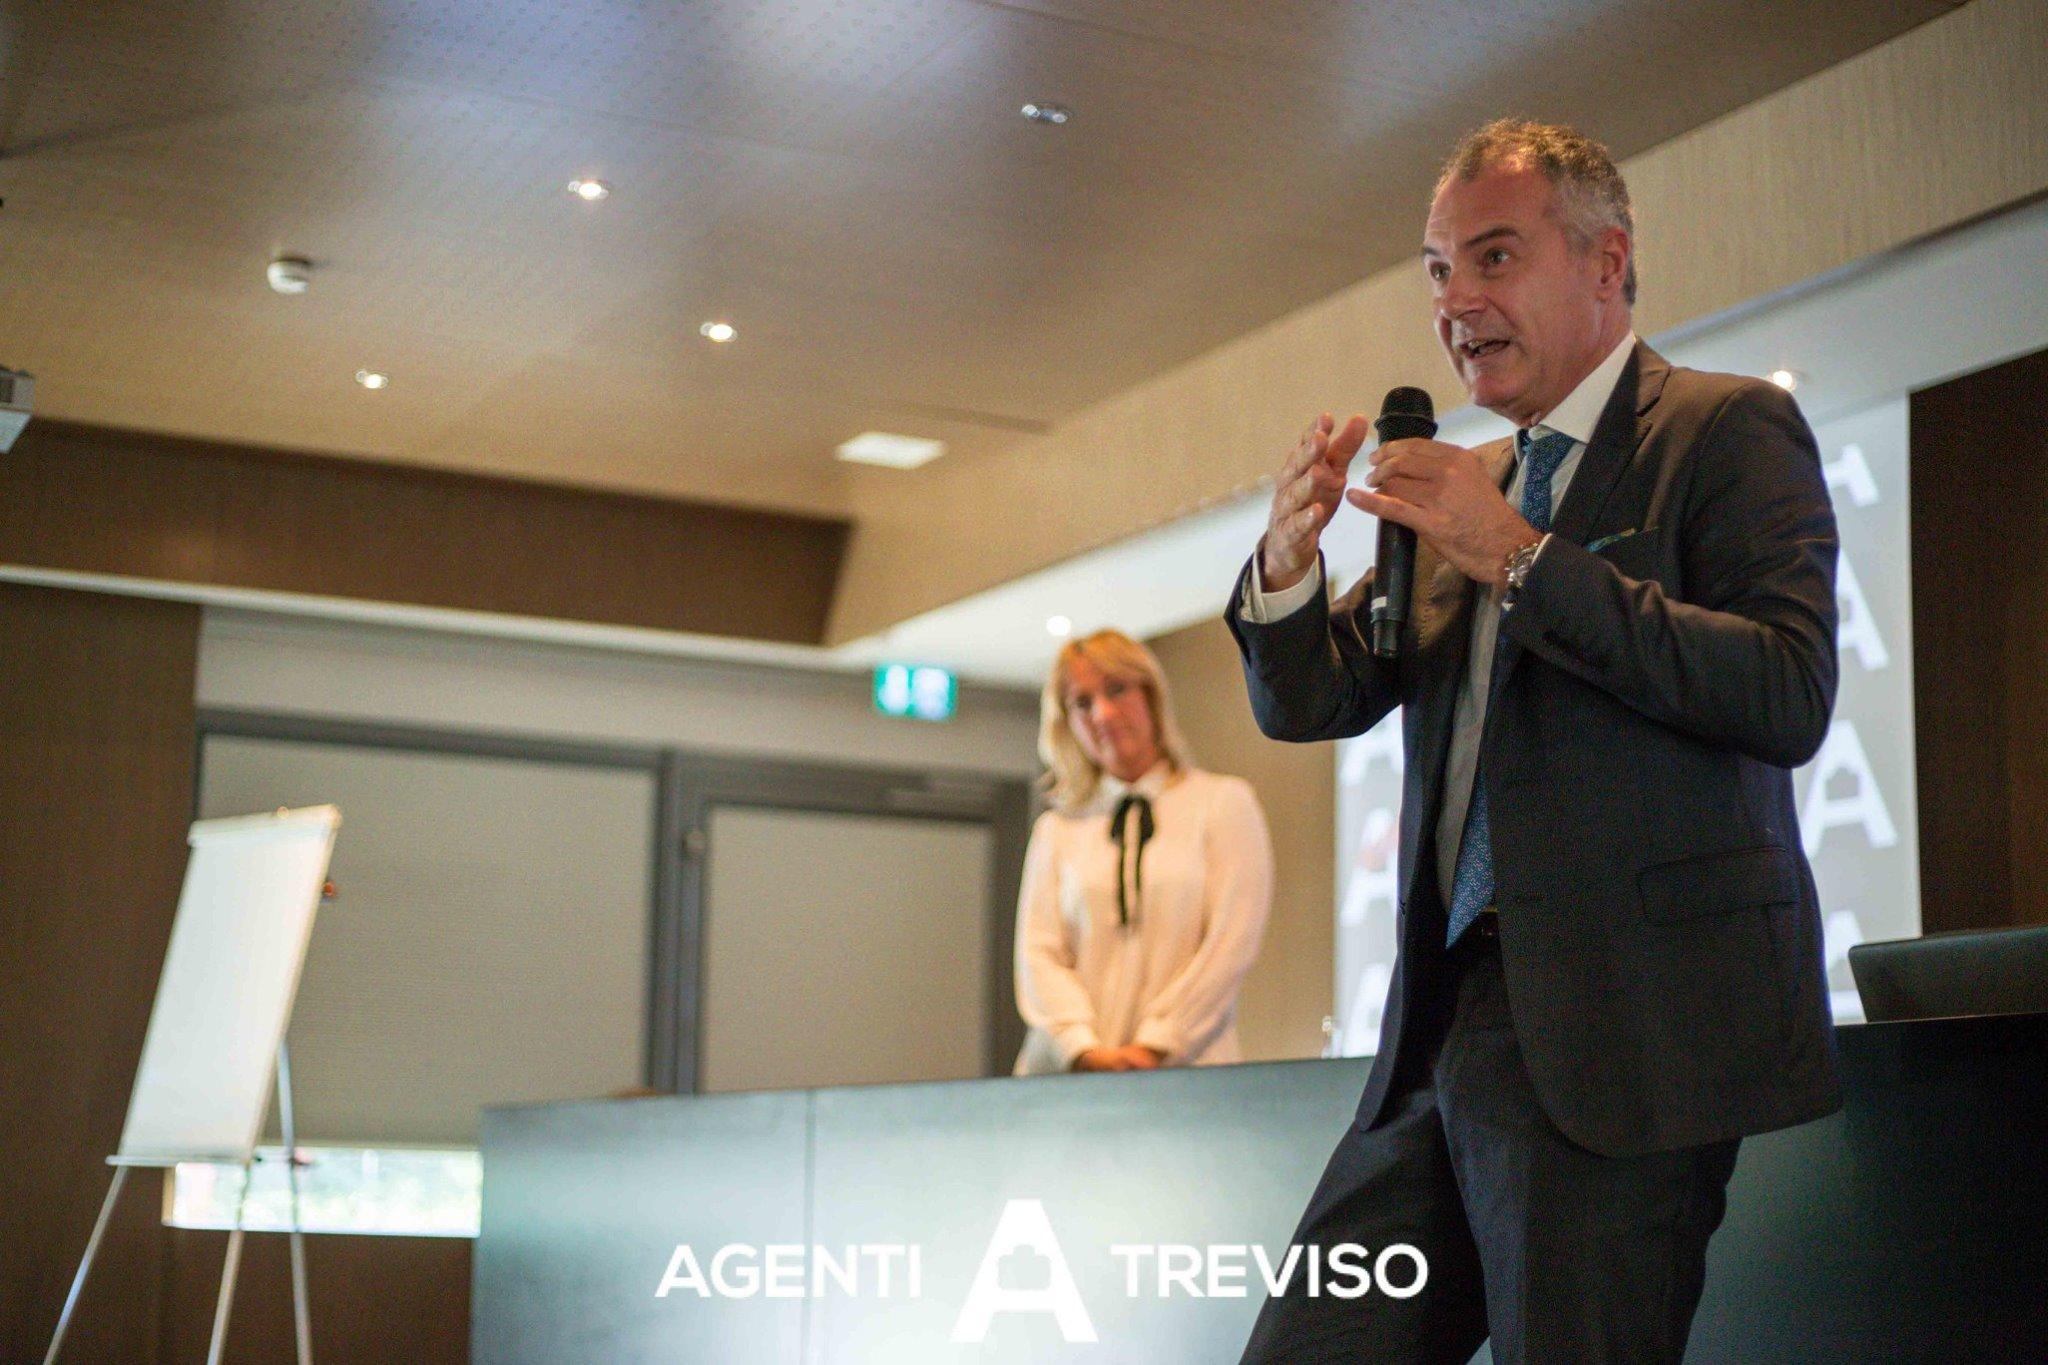 Agenti_Treviso_Concretix